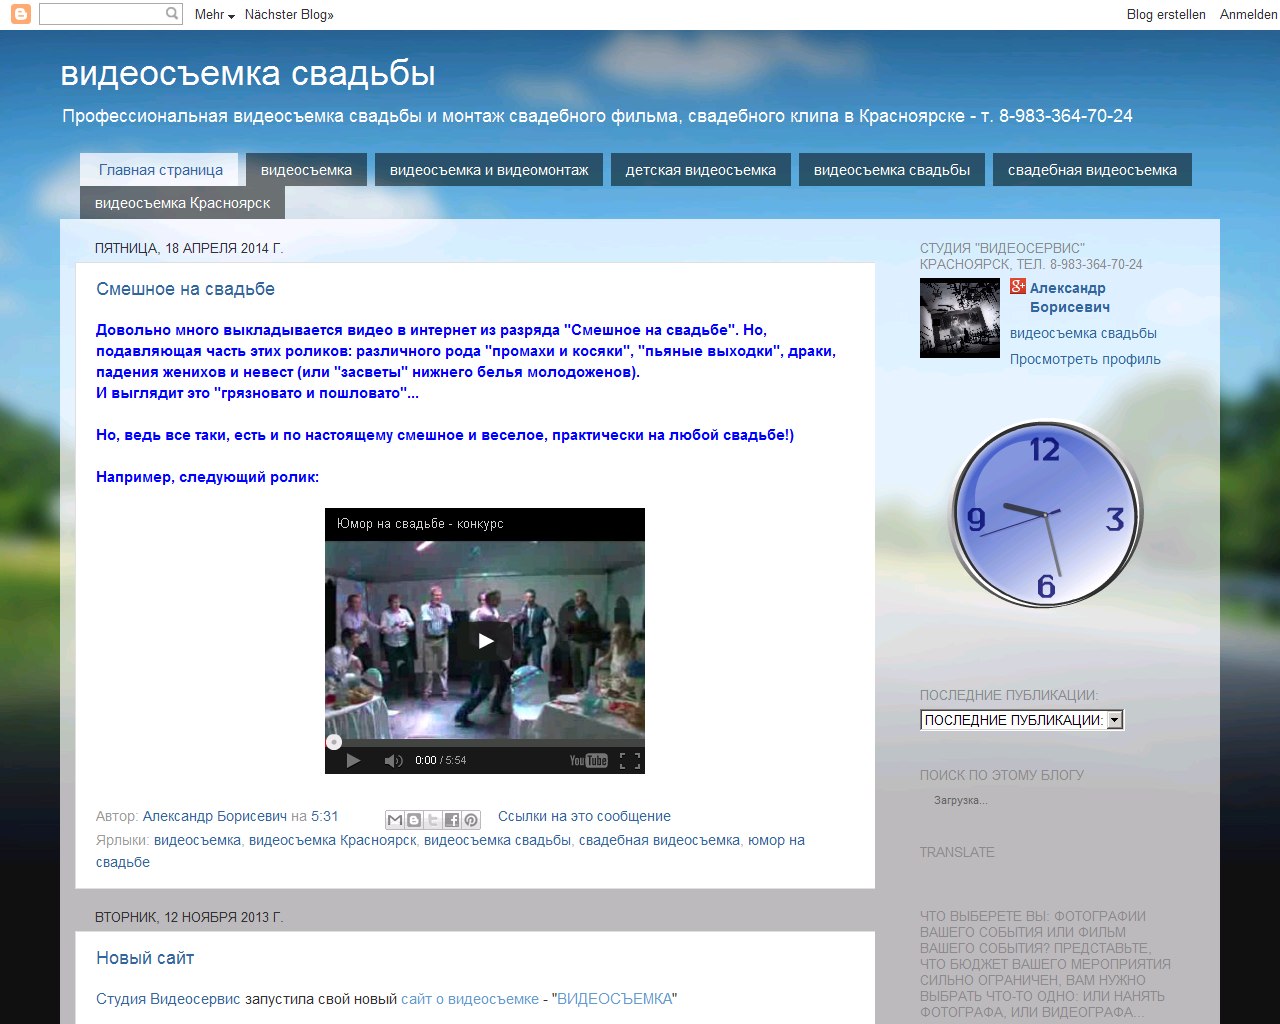 http://studia-videoservis.blogspot.ru